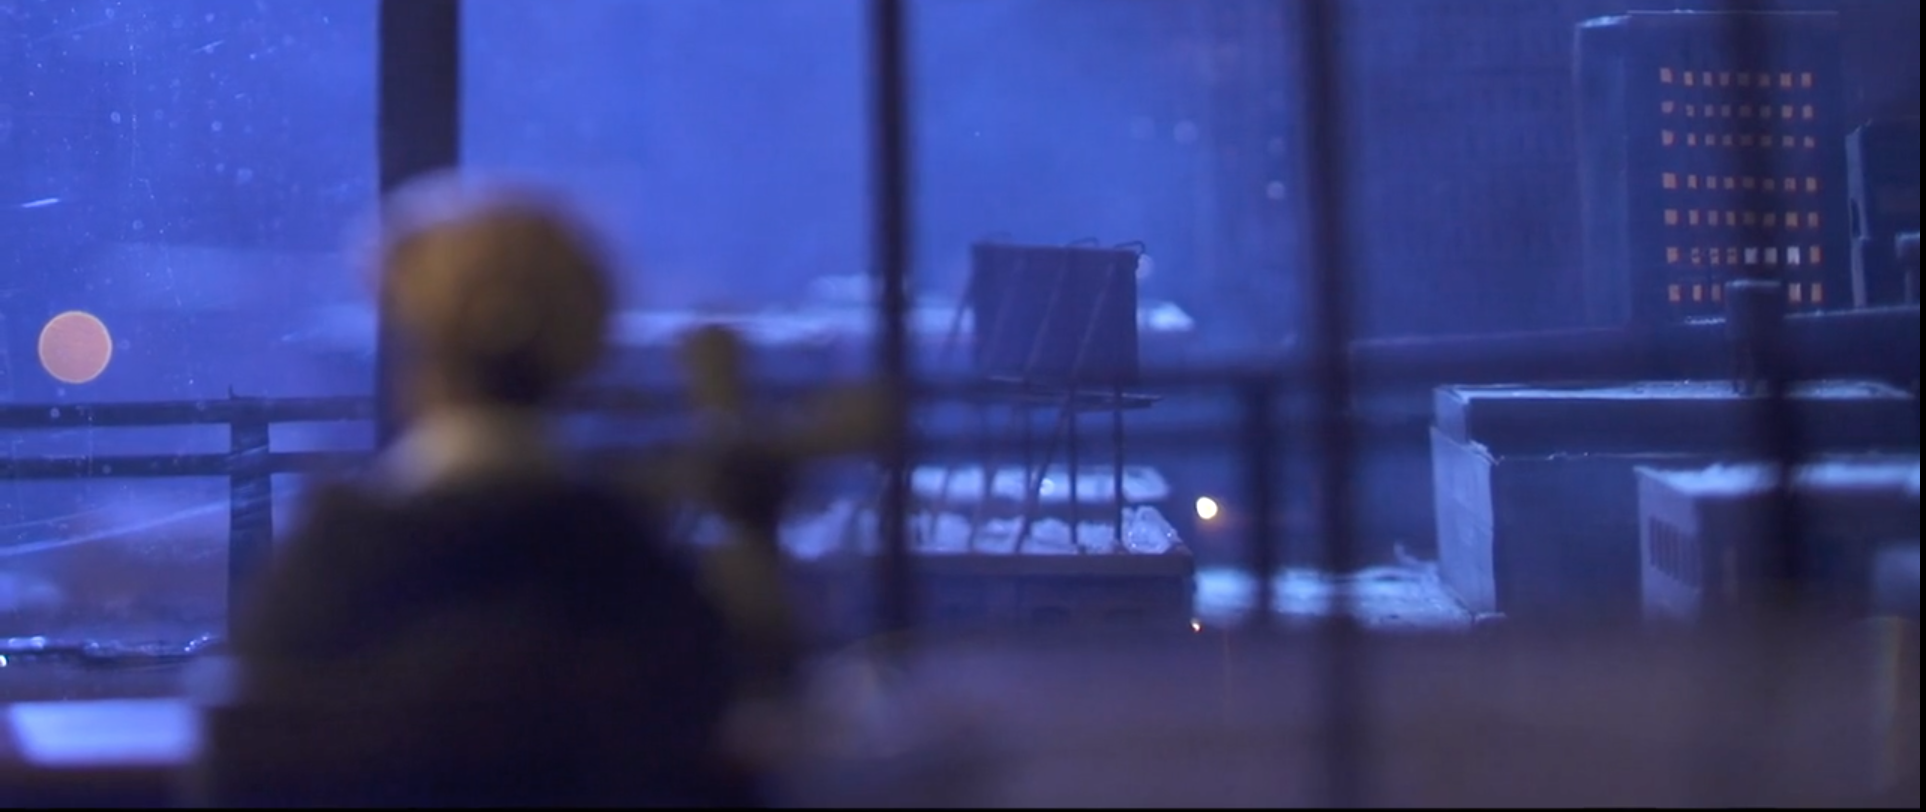 TIMELAPSE TALE OF A CITY - PRODUCTION DESIGNER | SHORT FILM